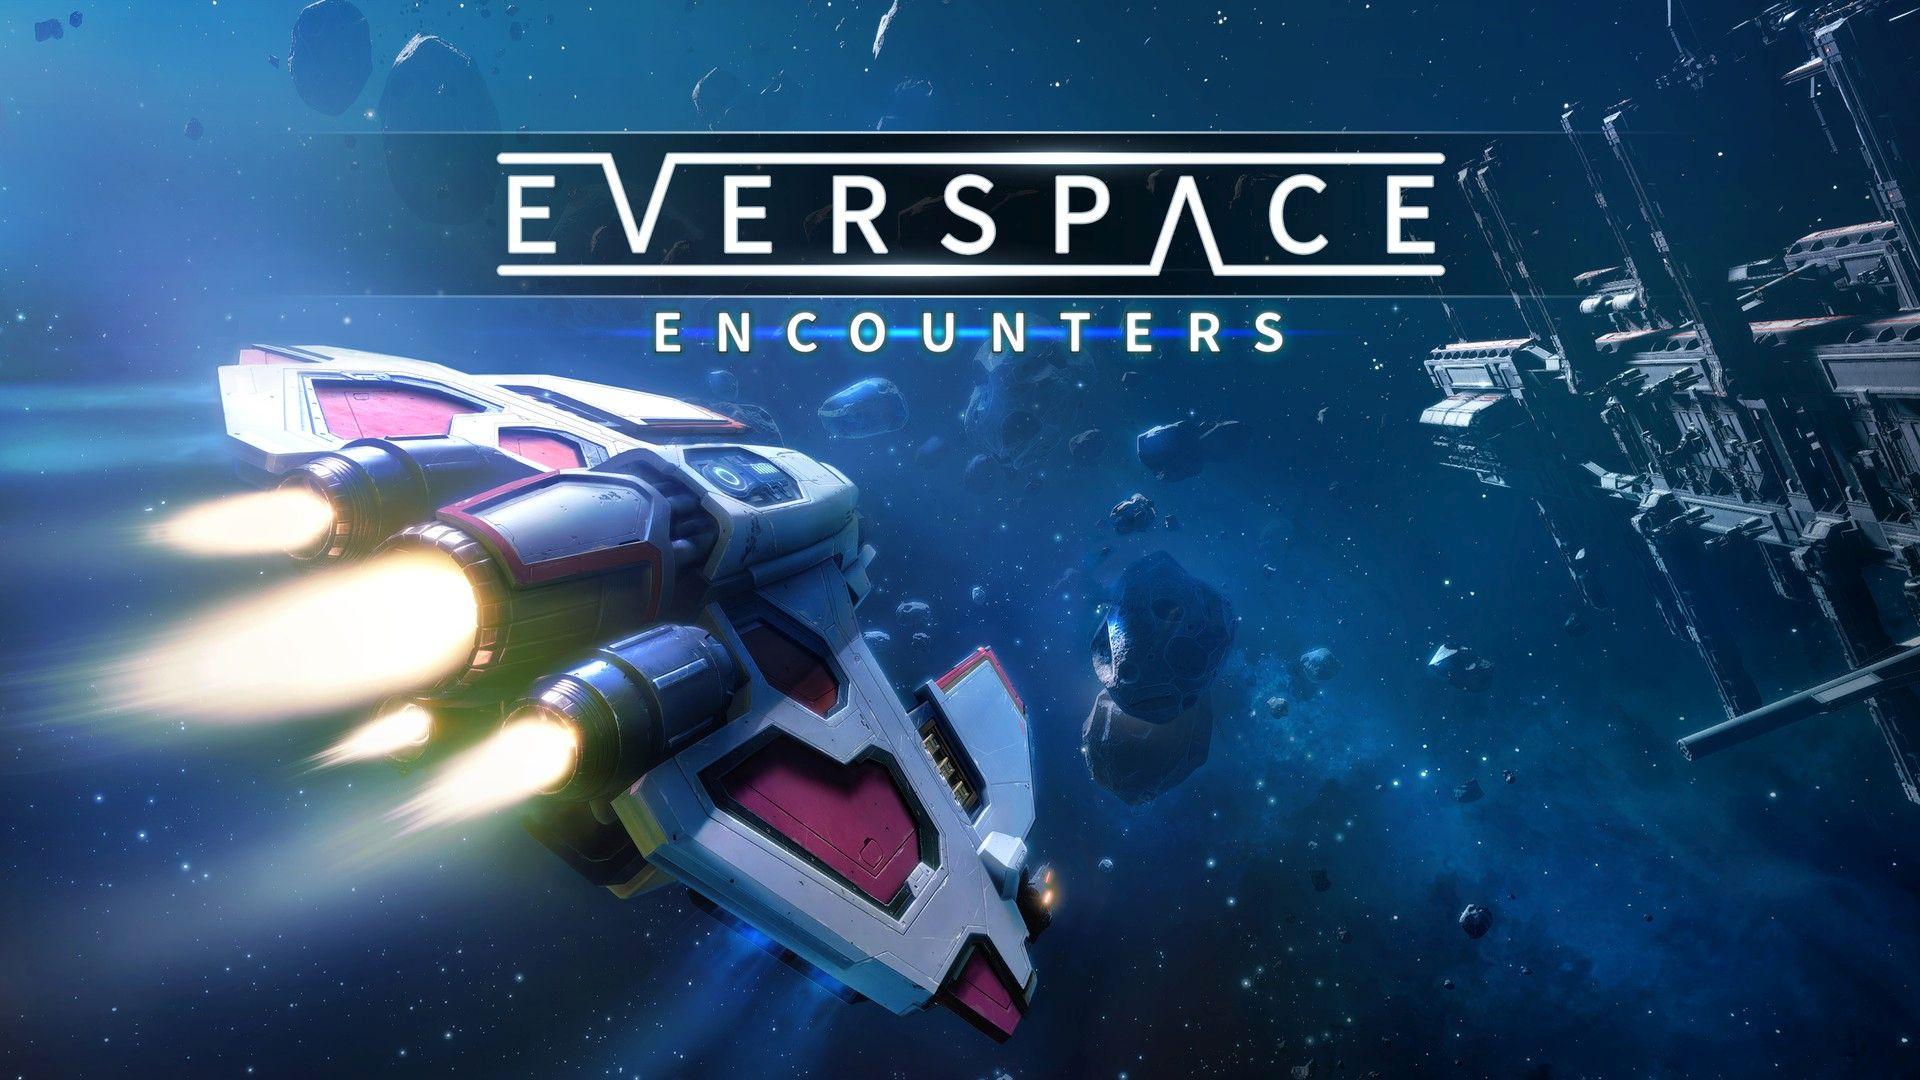 EVERSPACE - Encounters Keyvisual